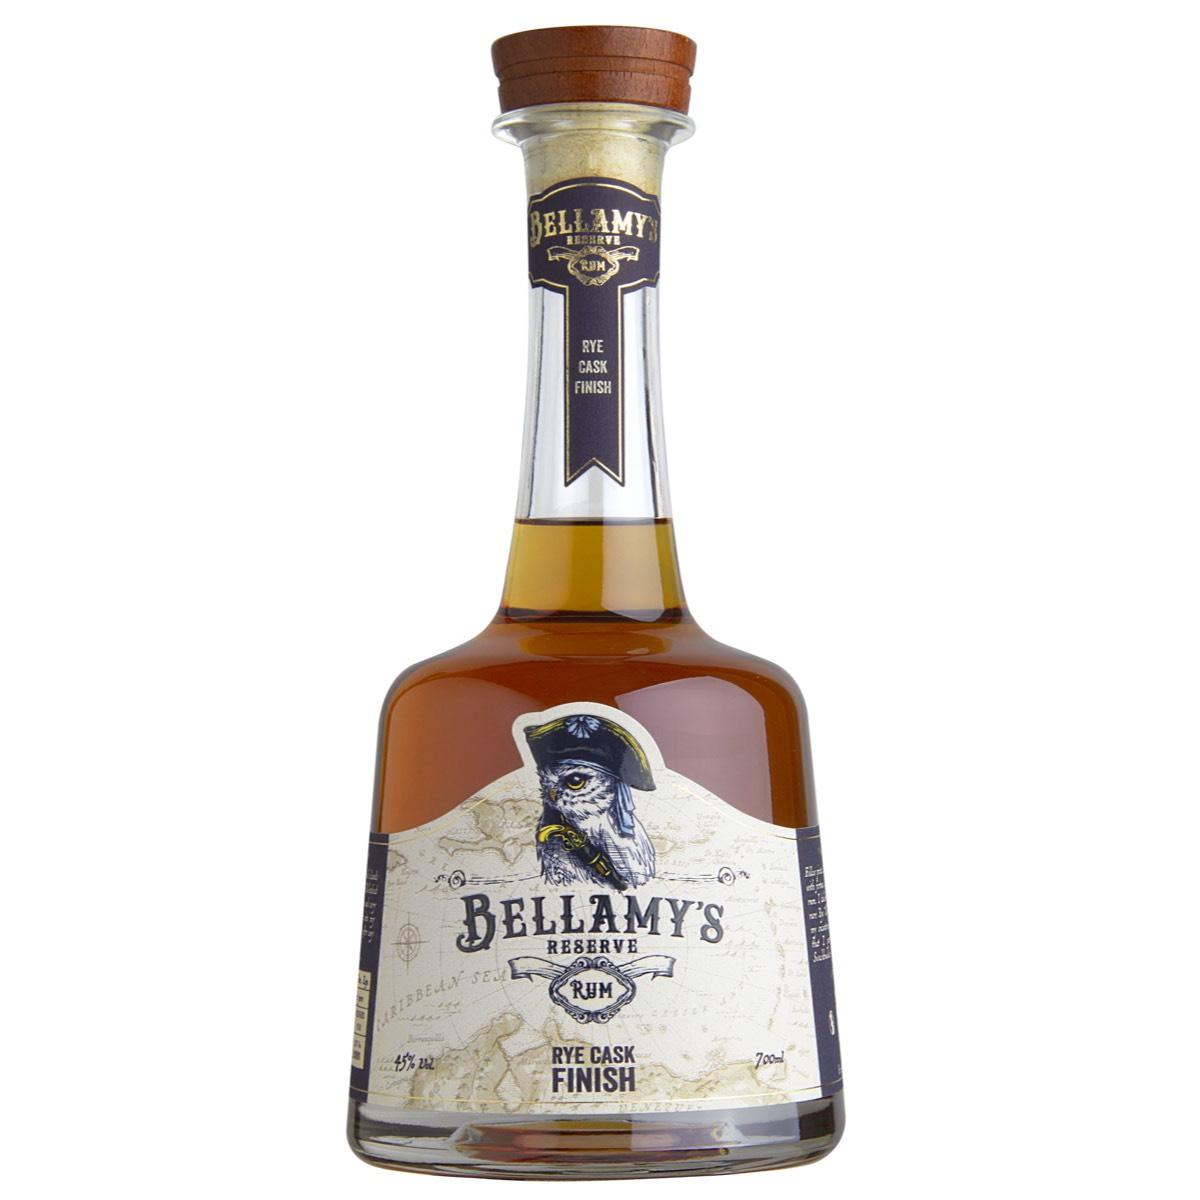 Bottle image of Bellamy's Reserve Rum Rye Cask Finish